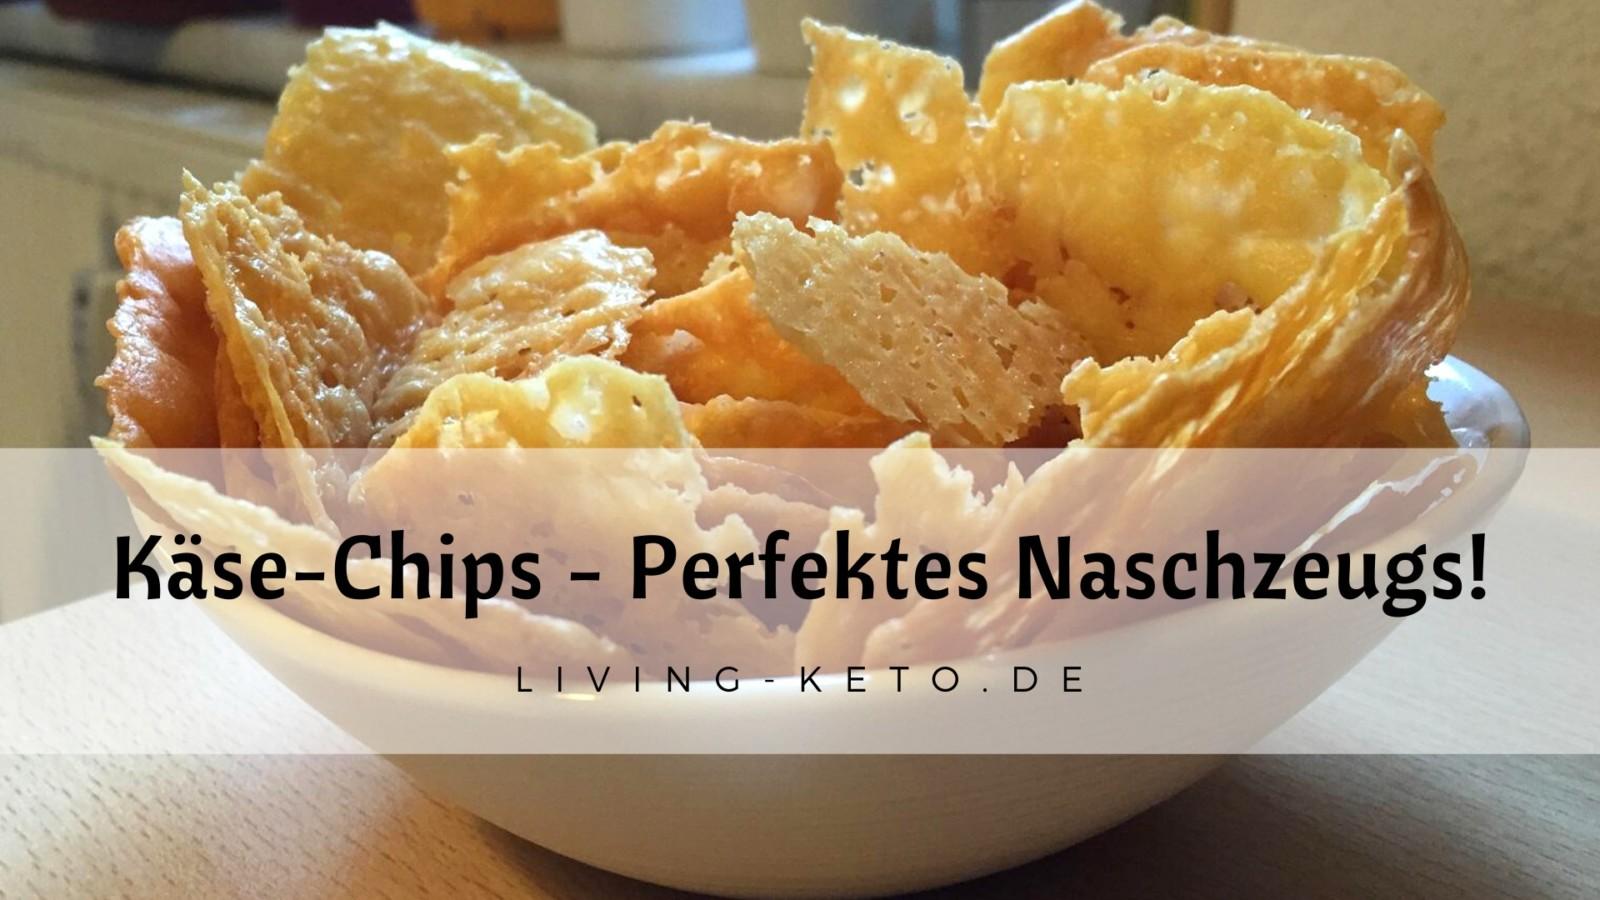 Käse-Chips – Perfektes Naschzeugs!